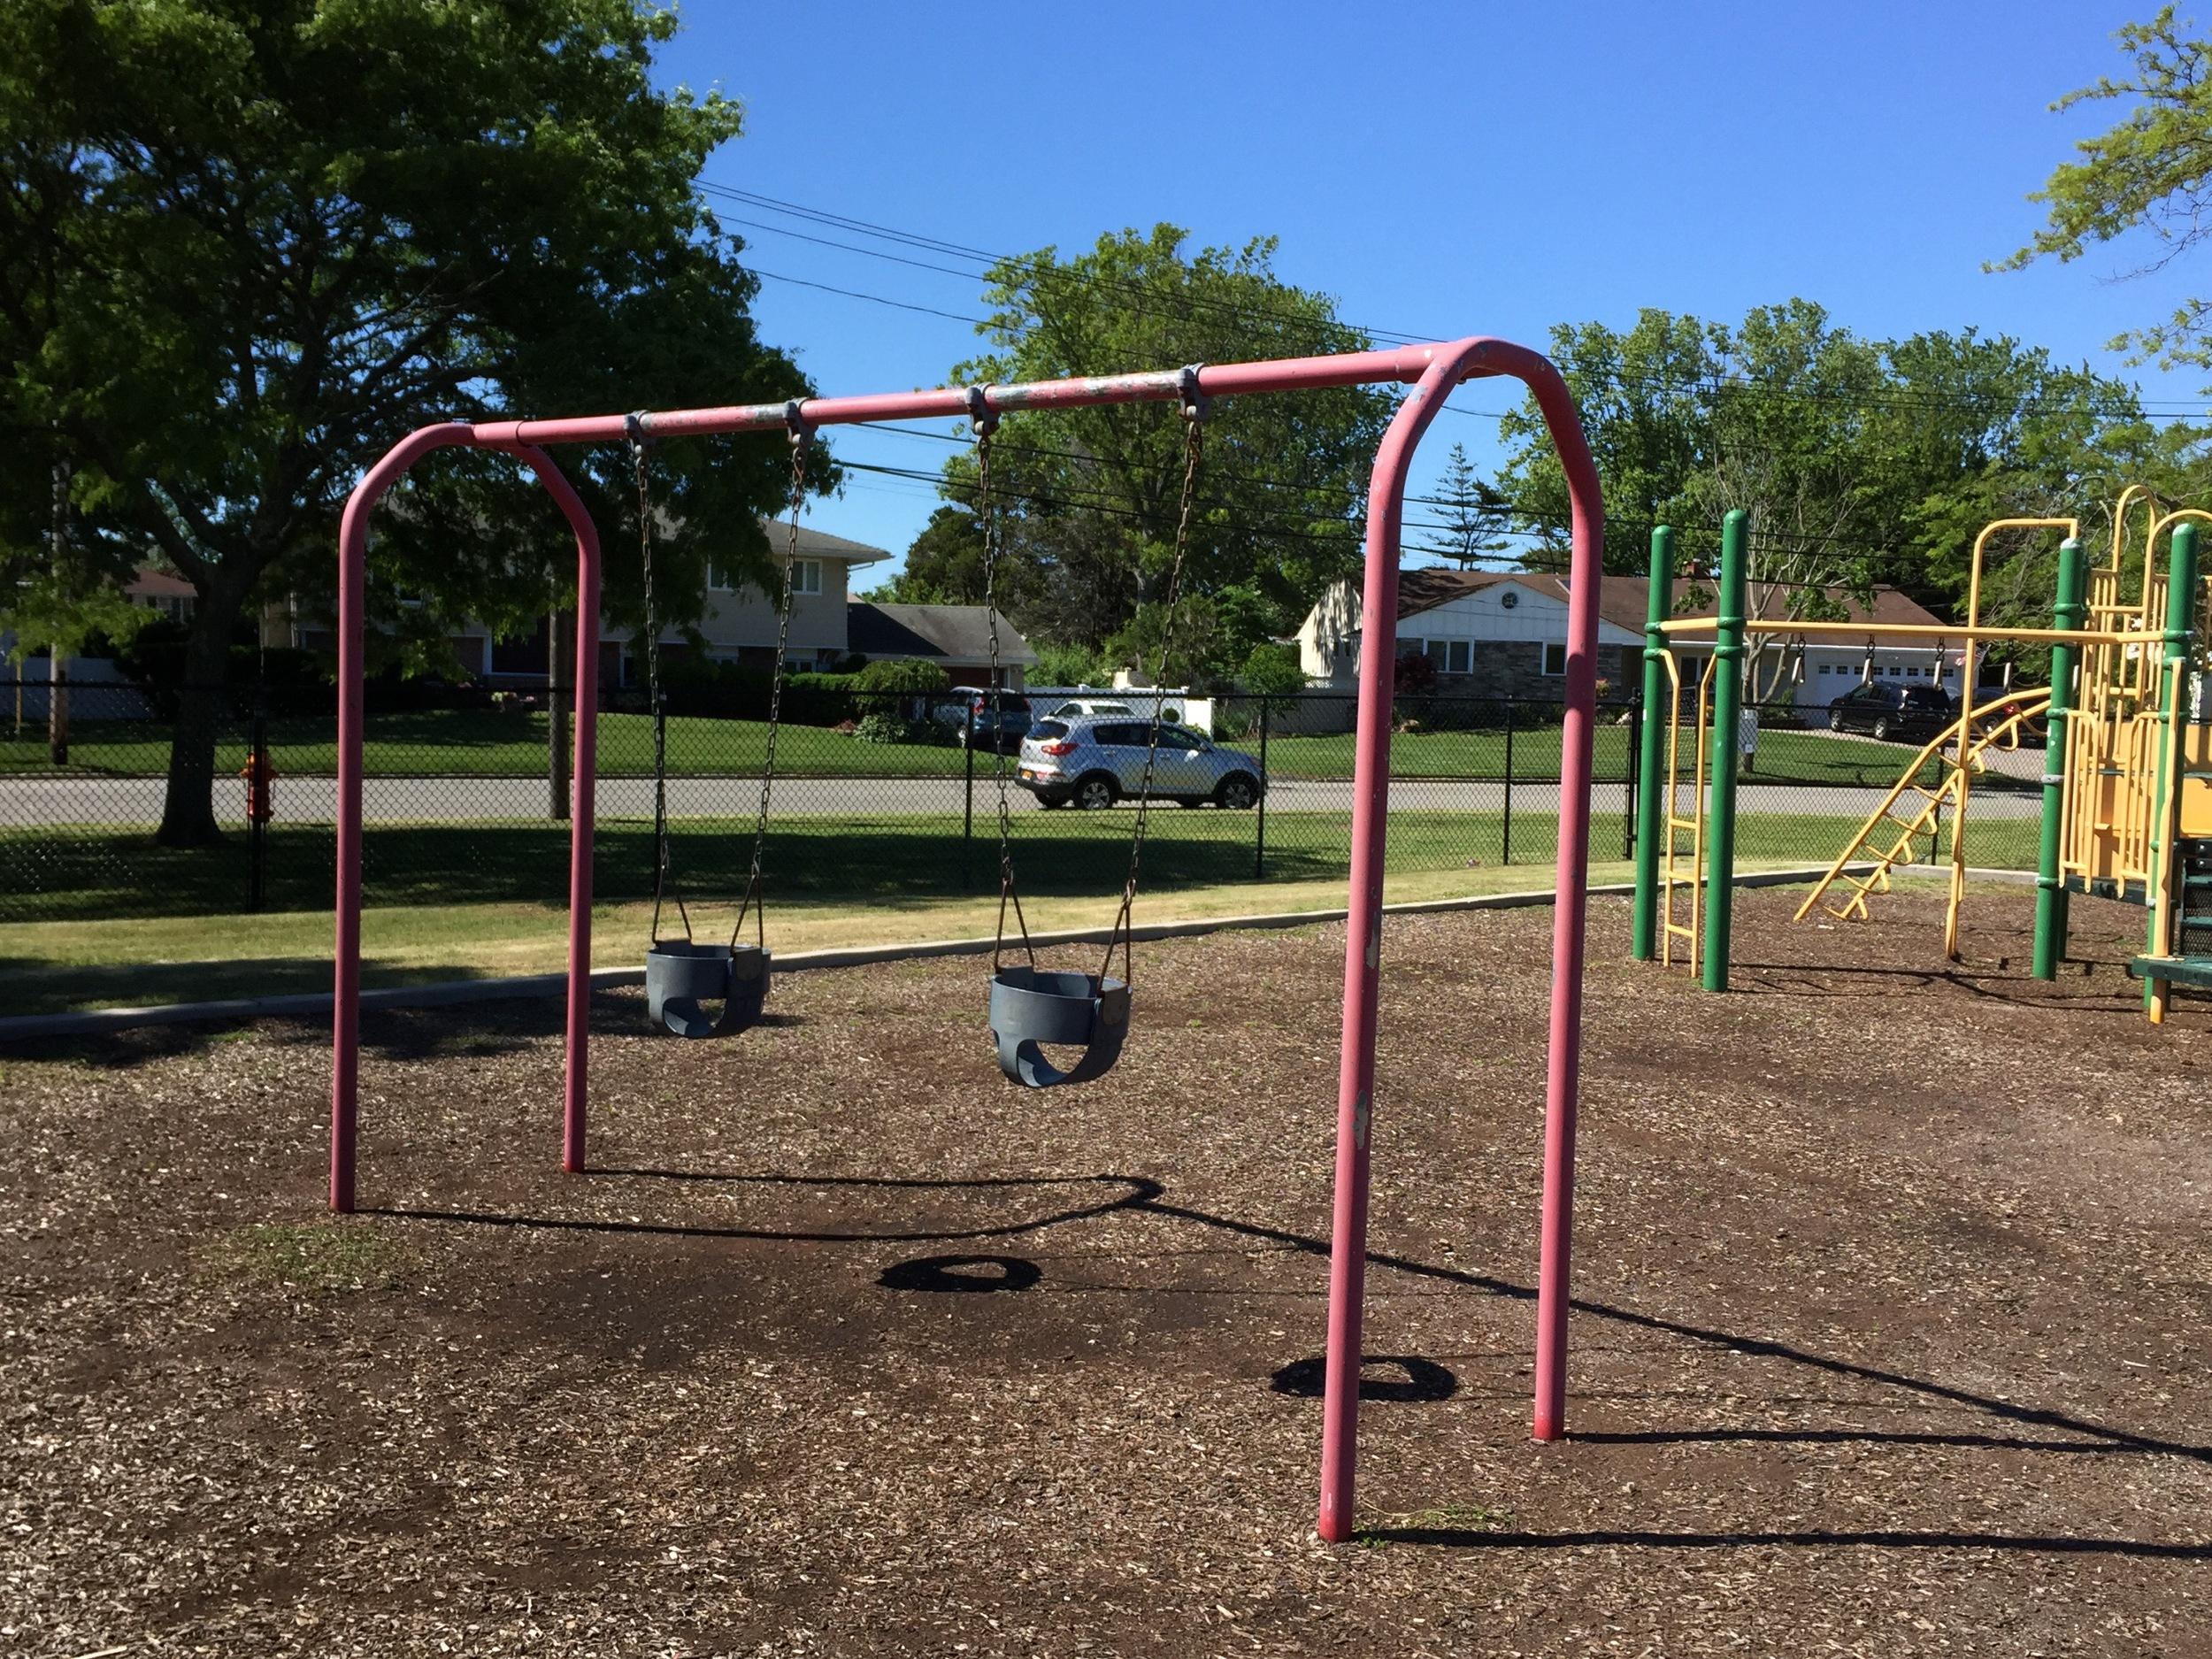 Swings at Sunset Park